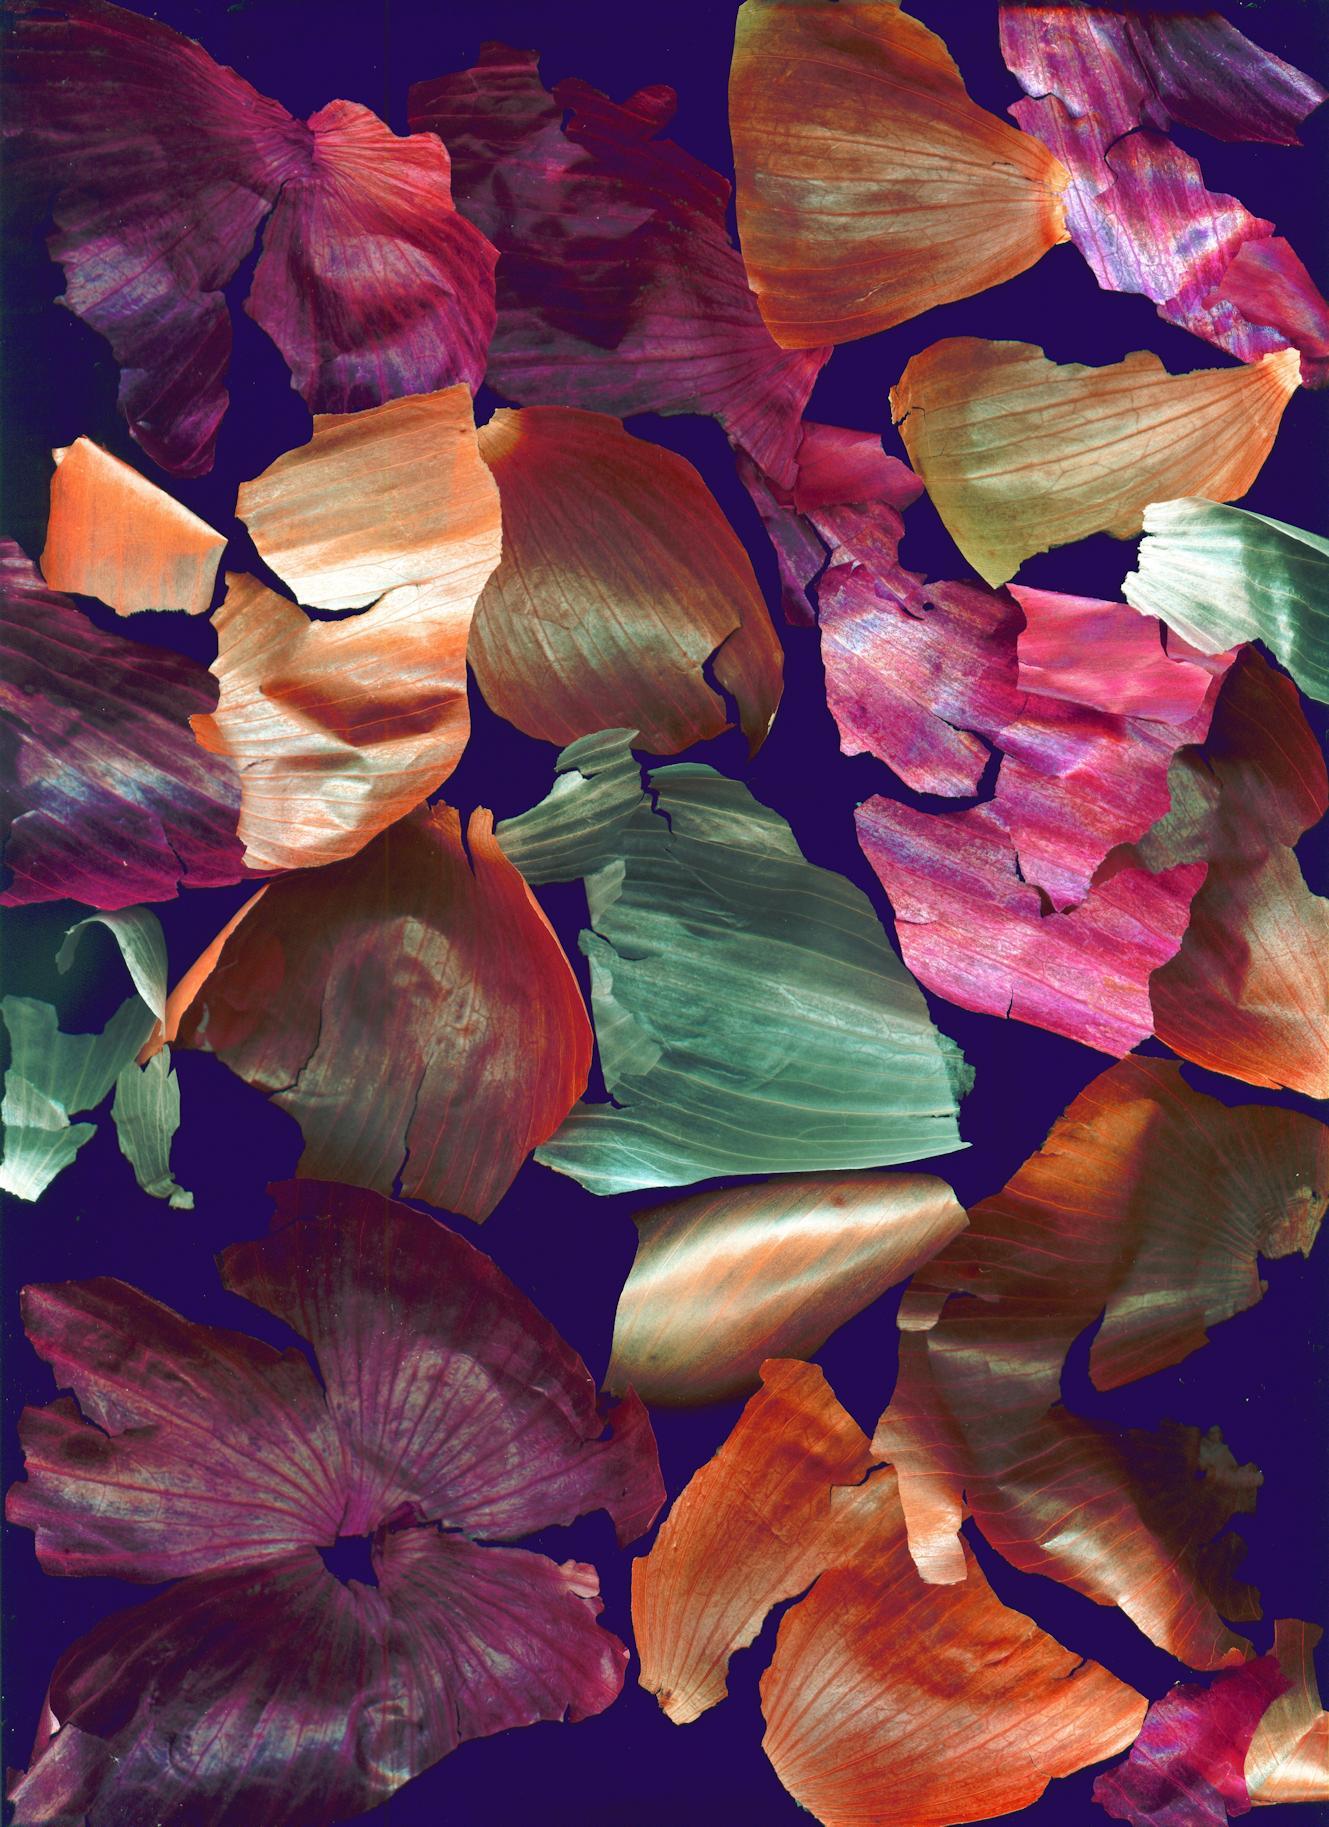 Paul Evans -  Colorful Onion Skins , 2012  Omaha, NE